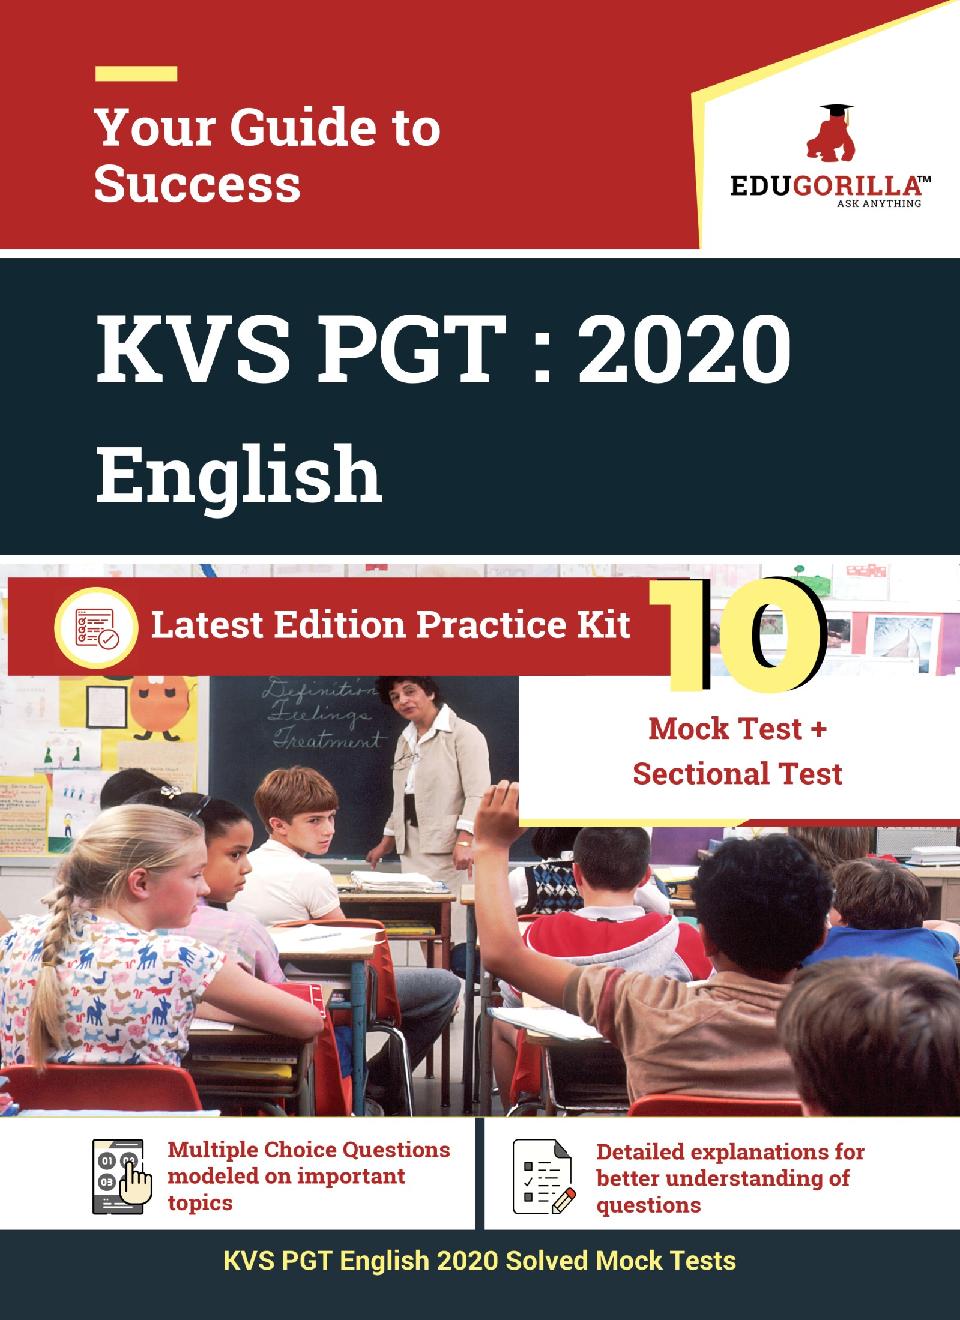 EduGorilla KVS PGT (English) 2020 | 10 Full-length Mock Test + Sectional Test - Page 1